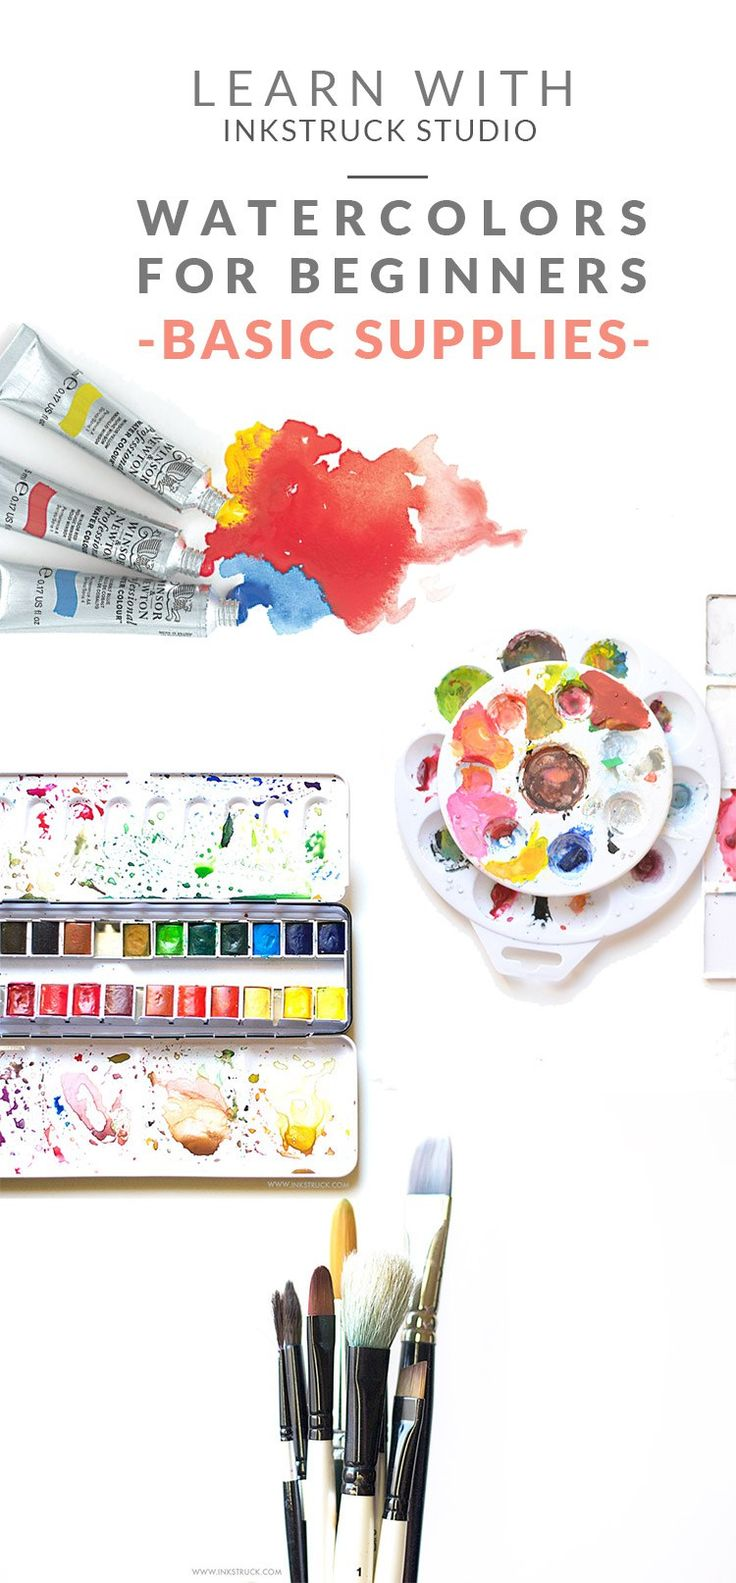 Watercolors for beginners -Zakkiya Hamza  Inkstruck Studio